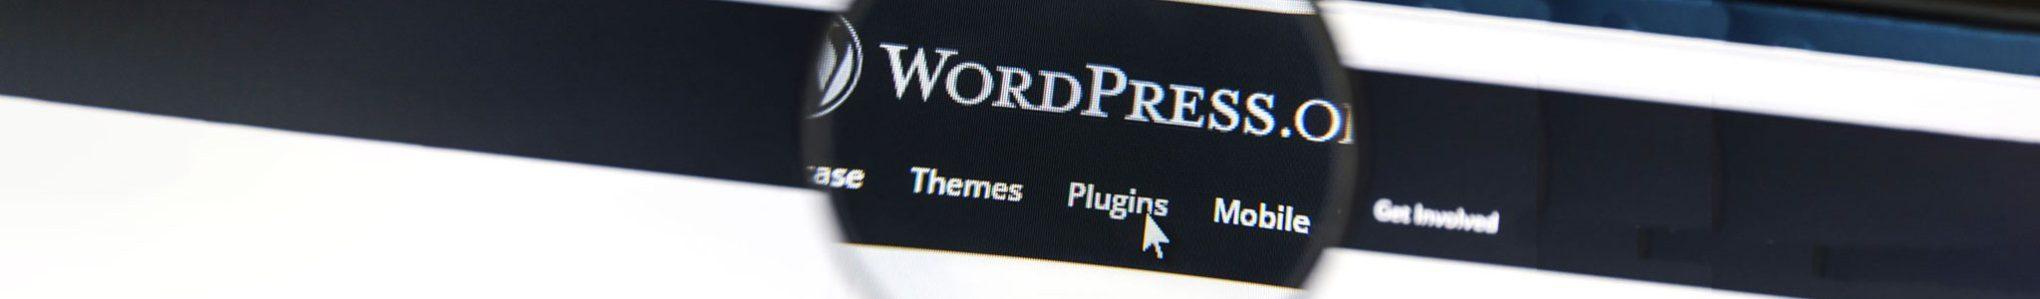 Navigation menu from wordpress.org